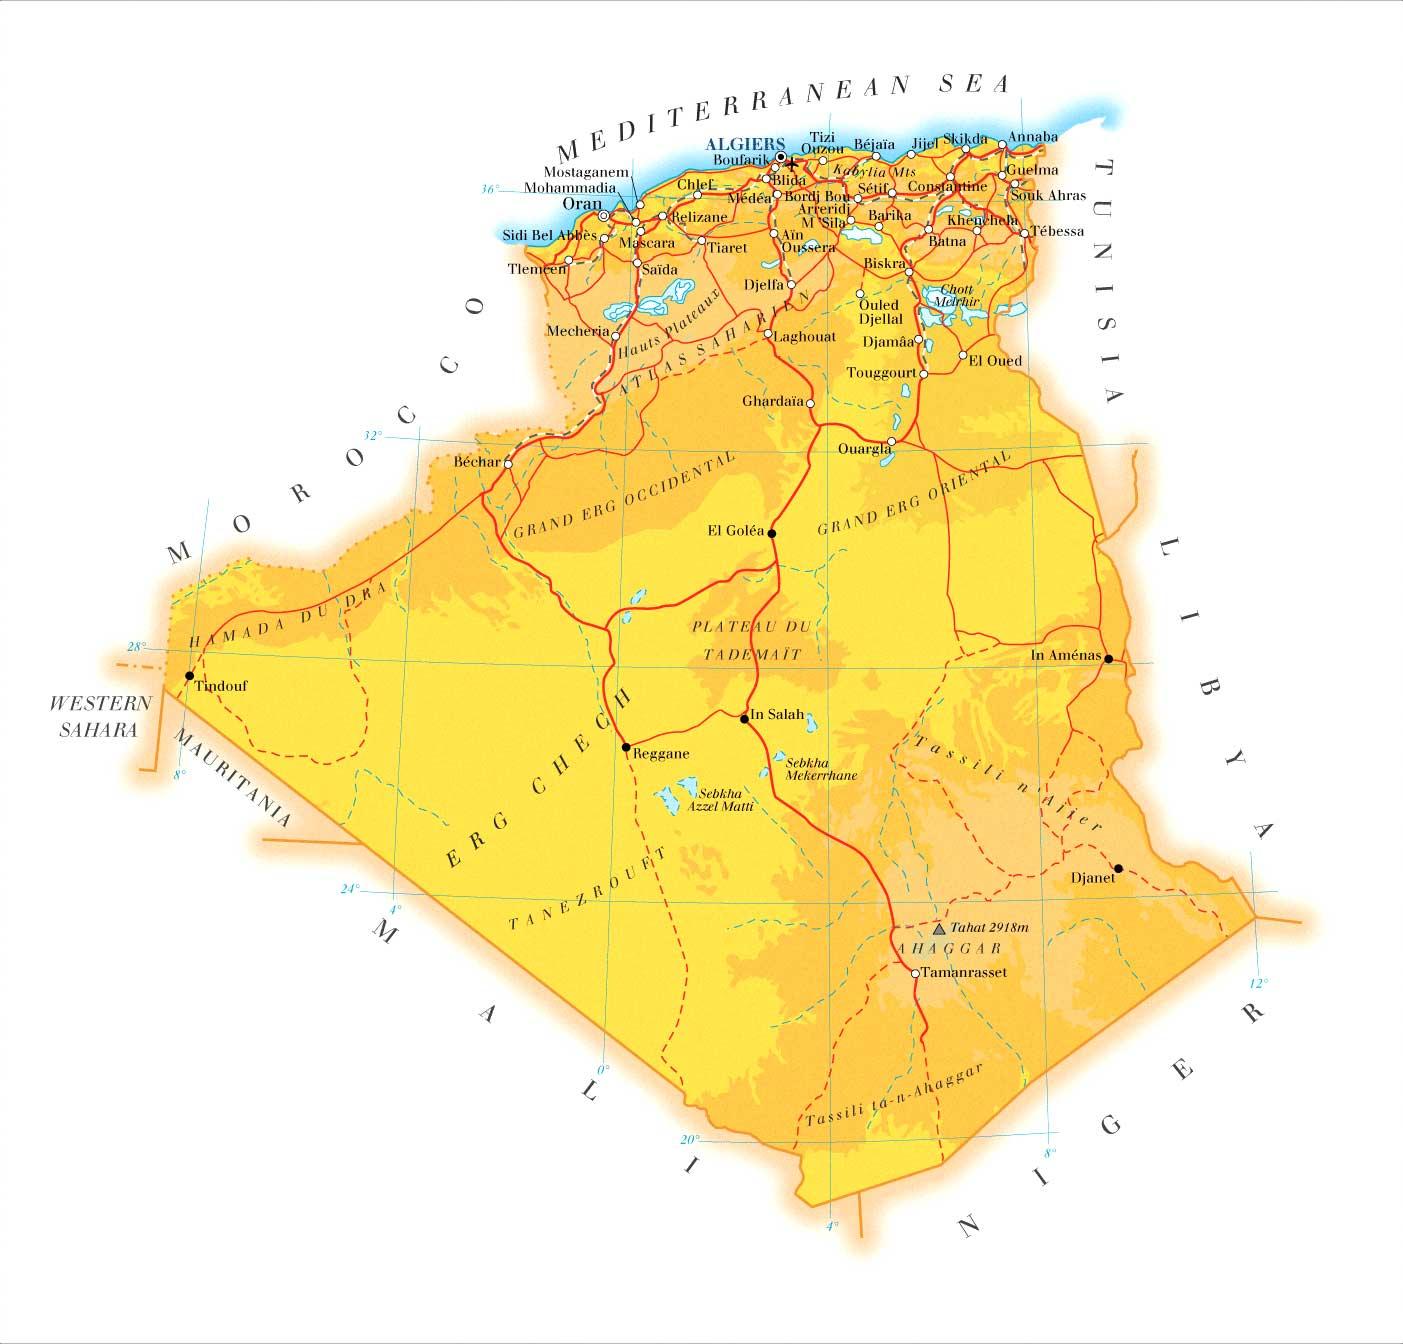 Argélia | Mapas Geográficos da Argélia